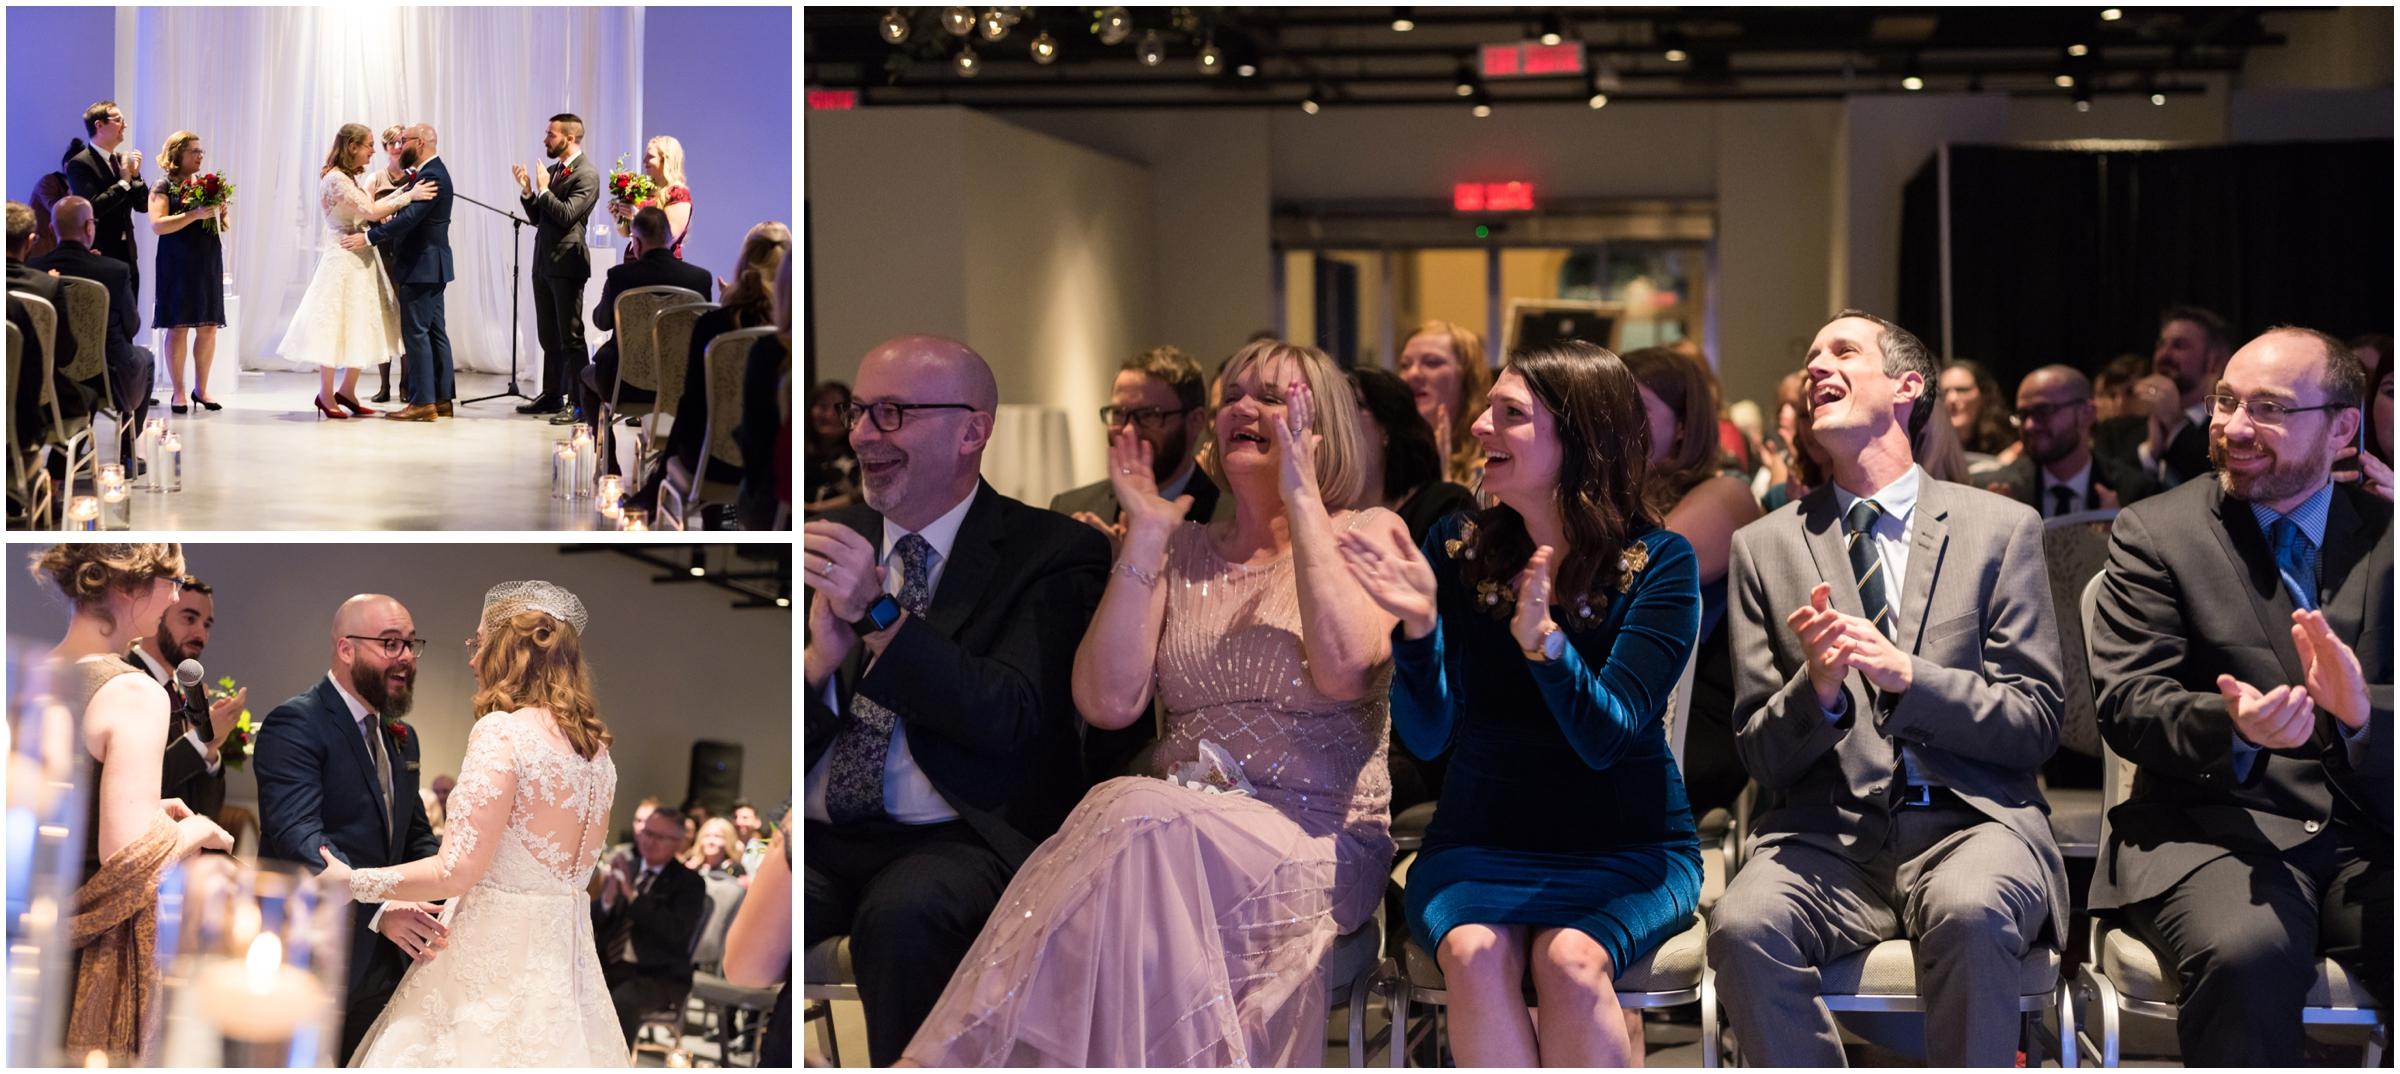 Ottaw Wedding Allison Andrew - (Selena Phillips-Boyle)_0074.jpg